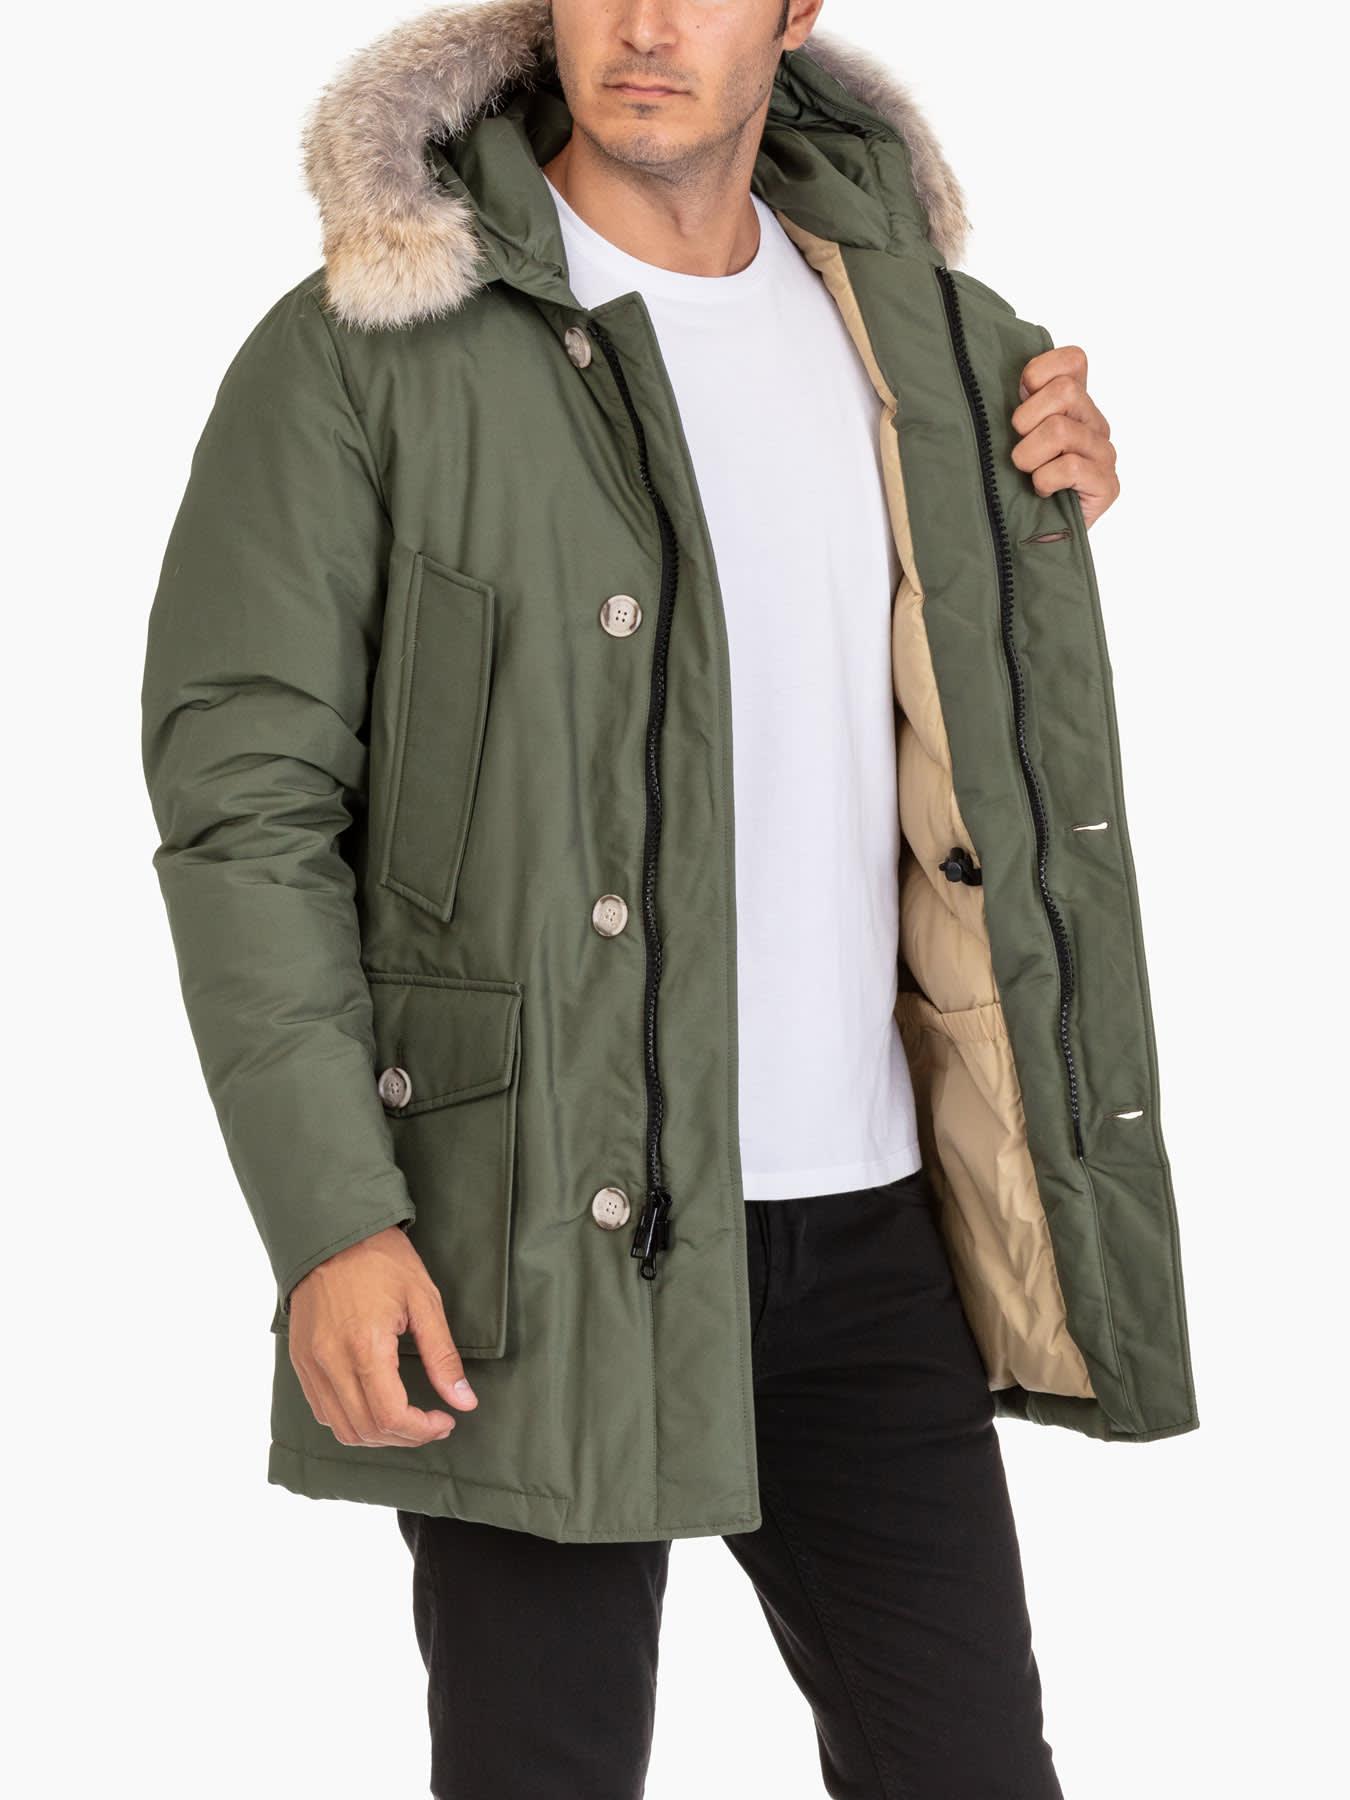 Woolrich Woolrich Arctic Parka Df Green 11131011   italist